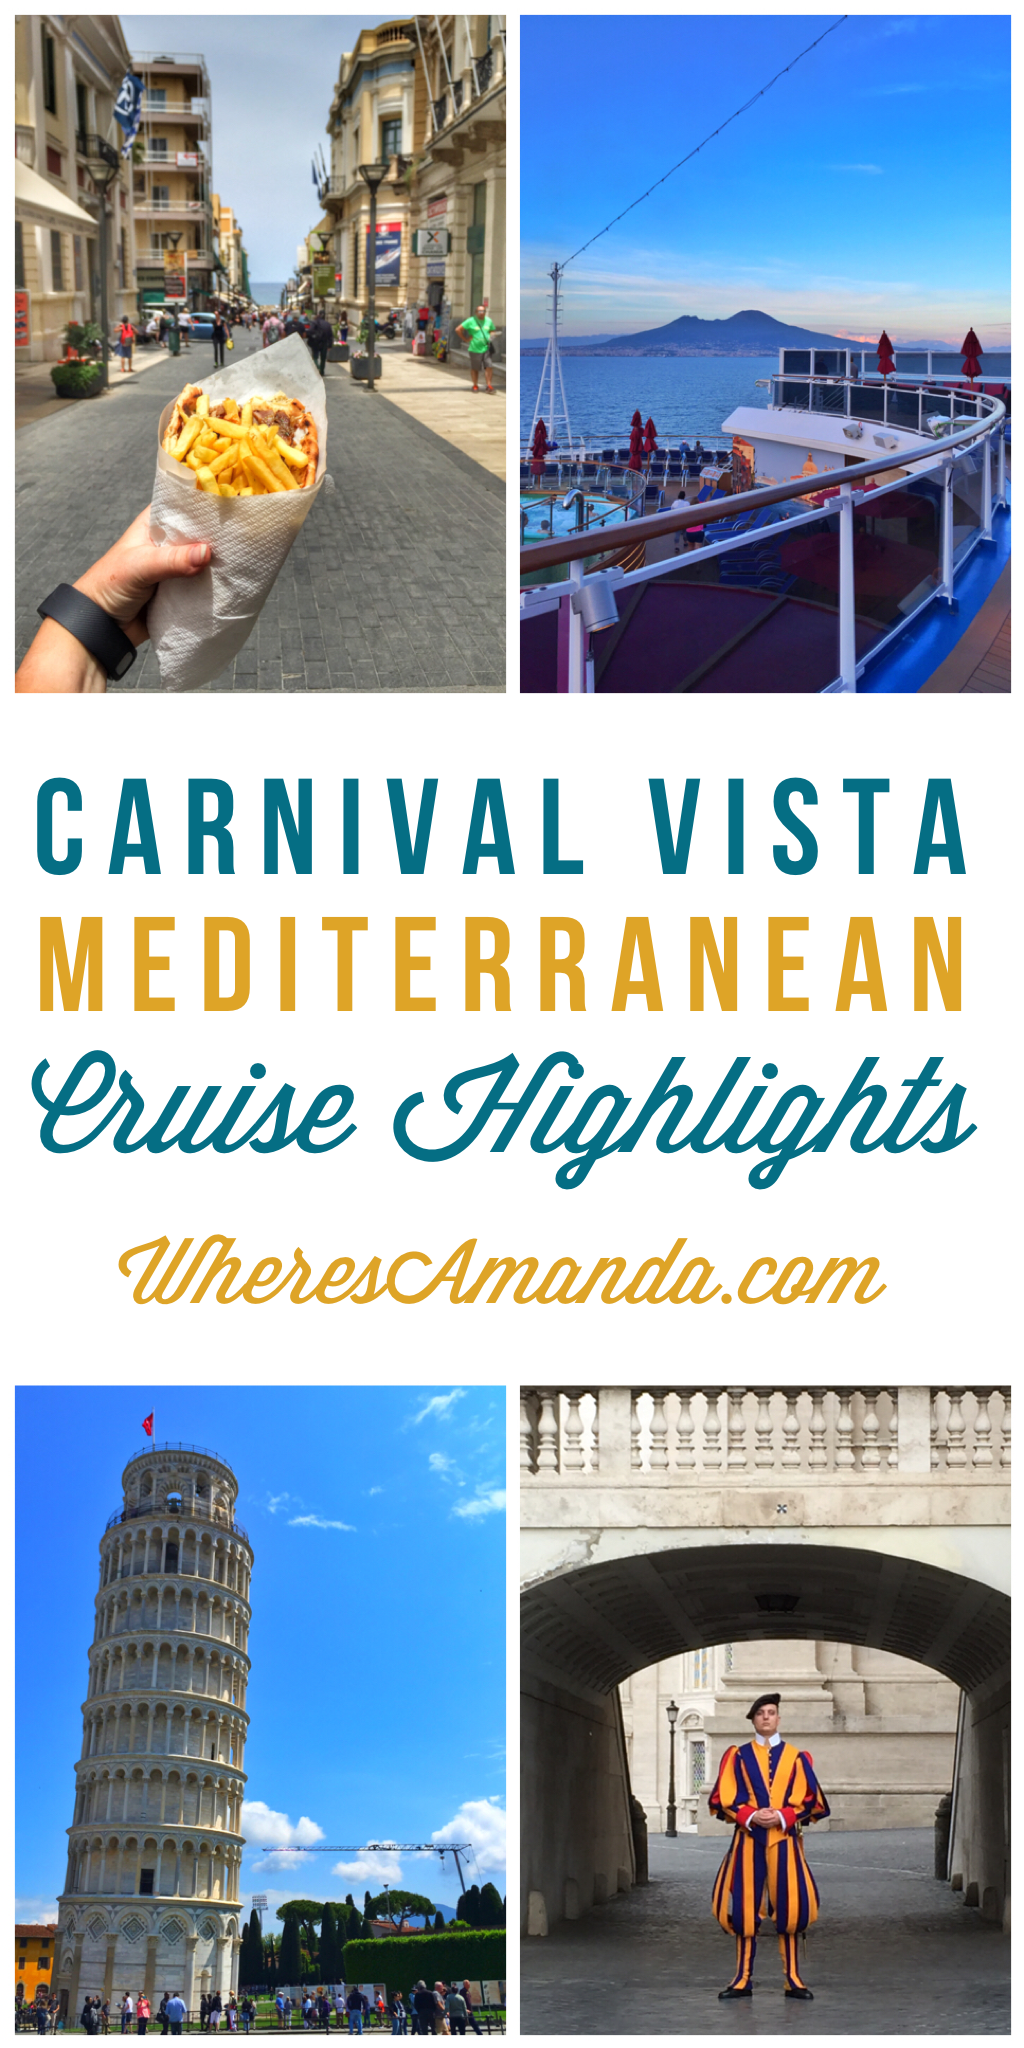 11 Day Carnival Vista Mediterranean Cruise Highlights